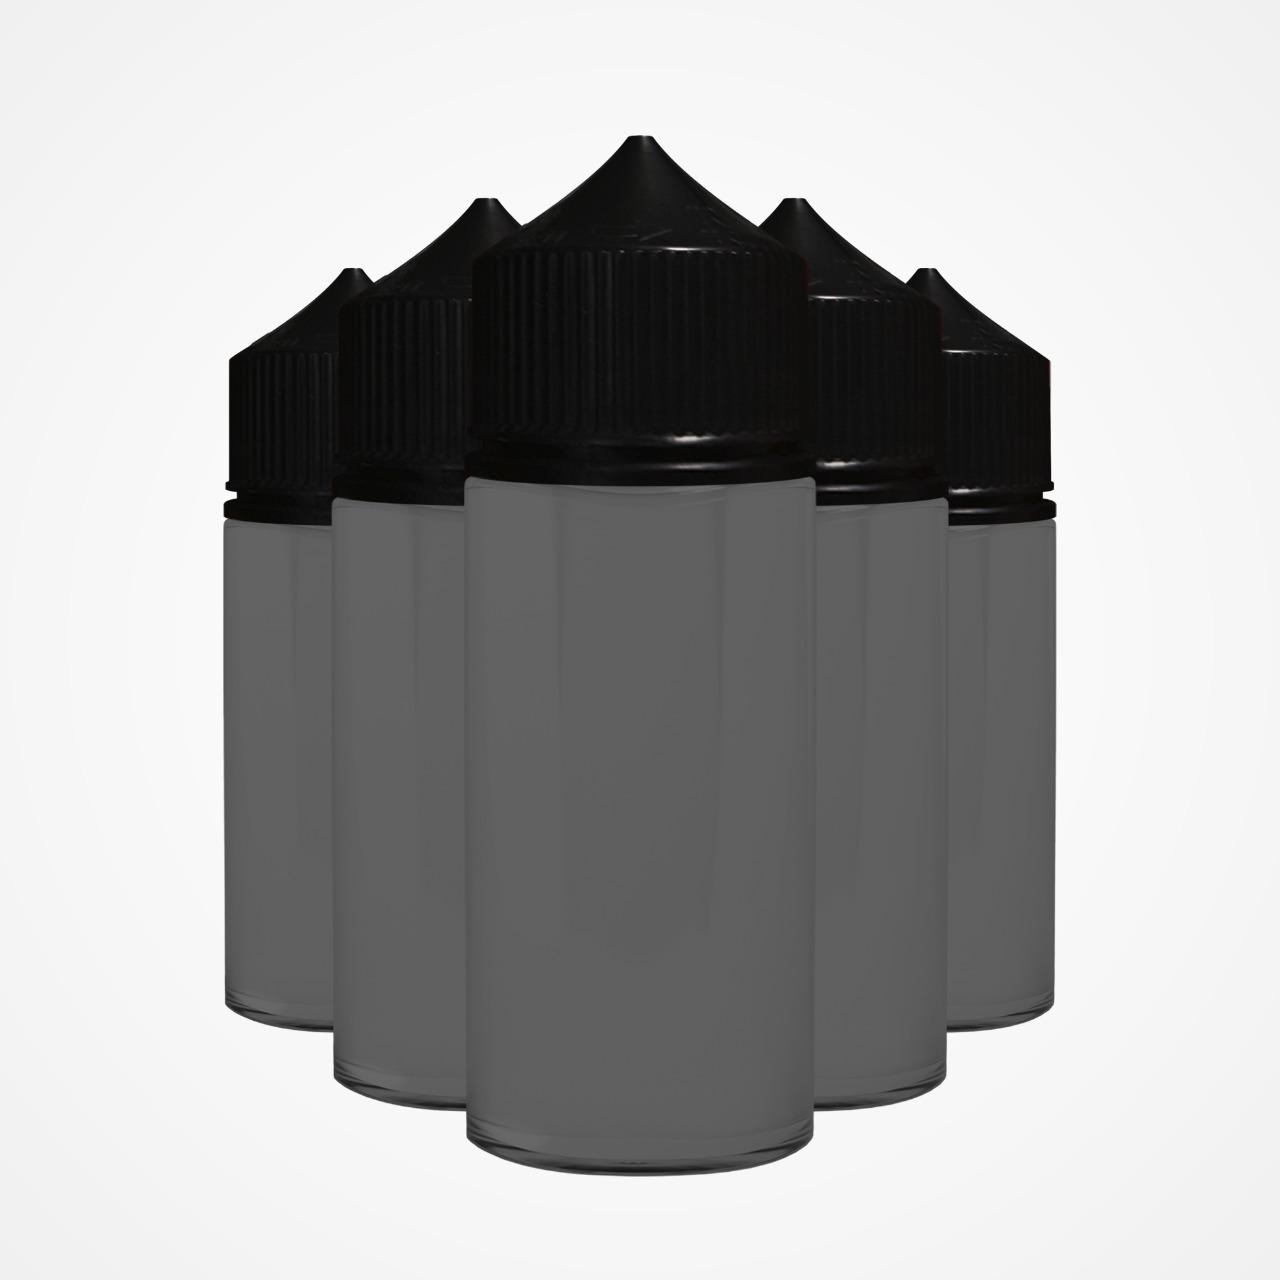 Frasco Chubby 100ml (5 unidades) - Black/Black  - VM Labs